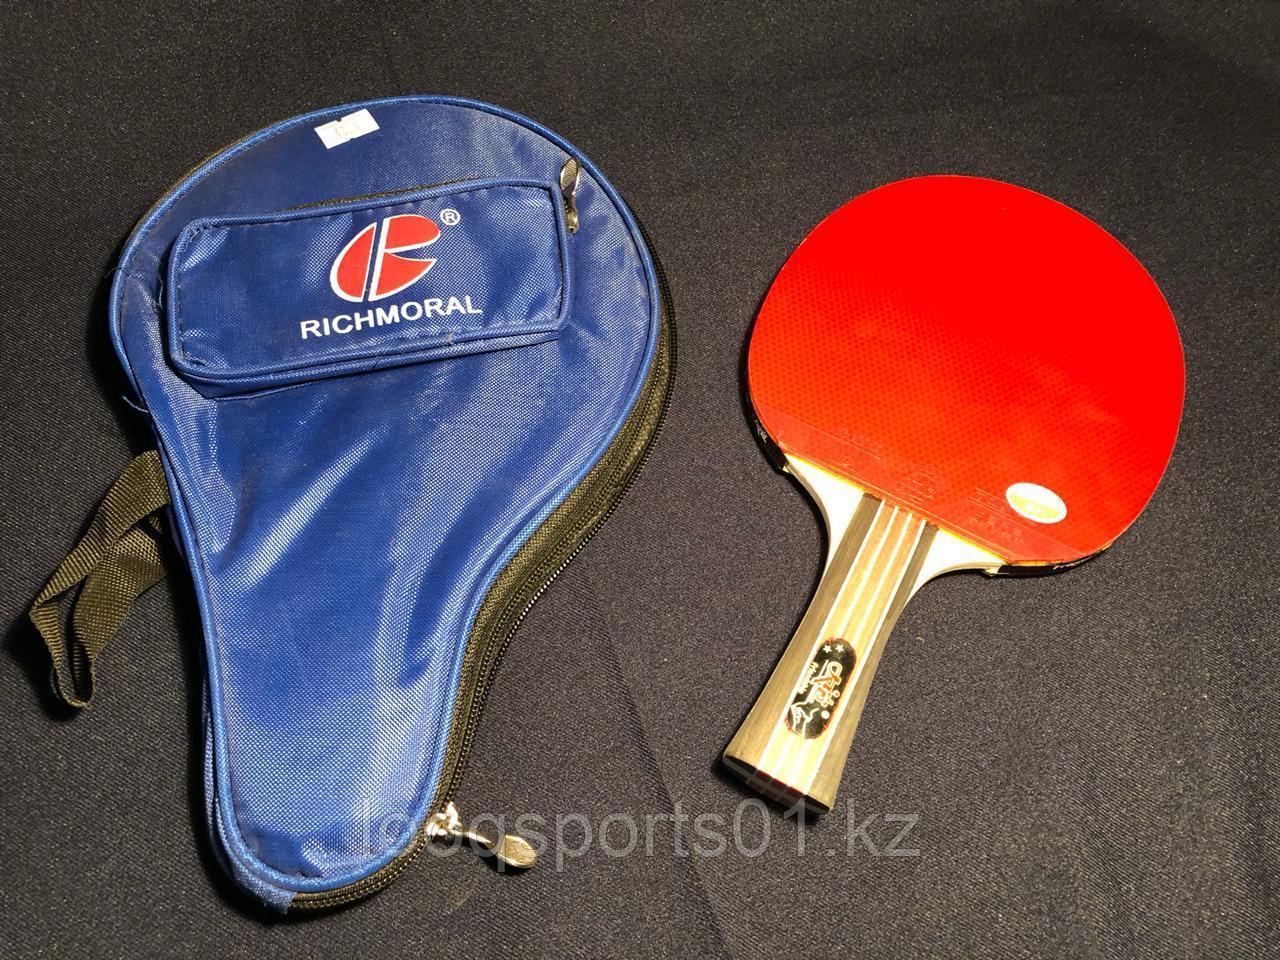 Ракетки для настольного тенниса Richmoral